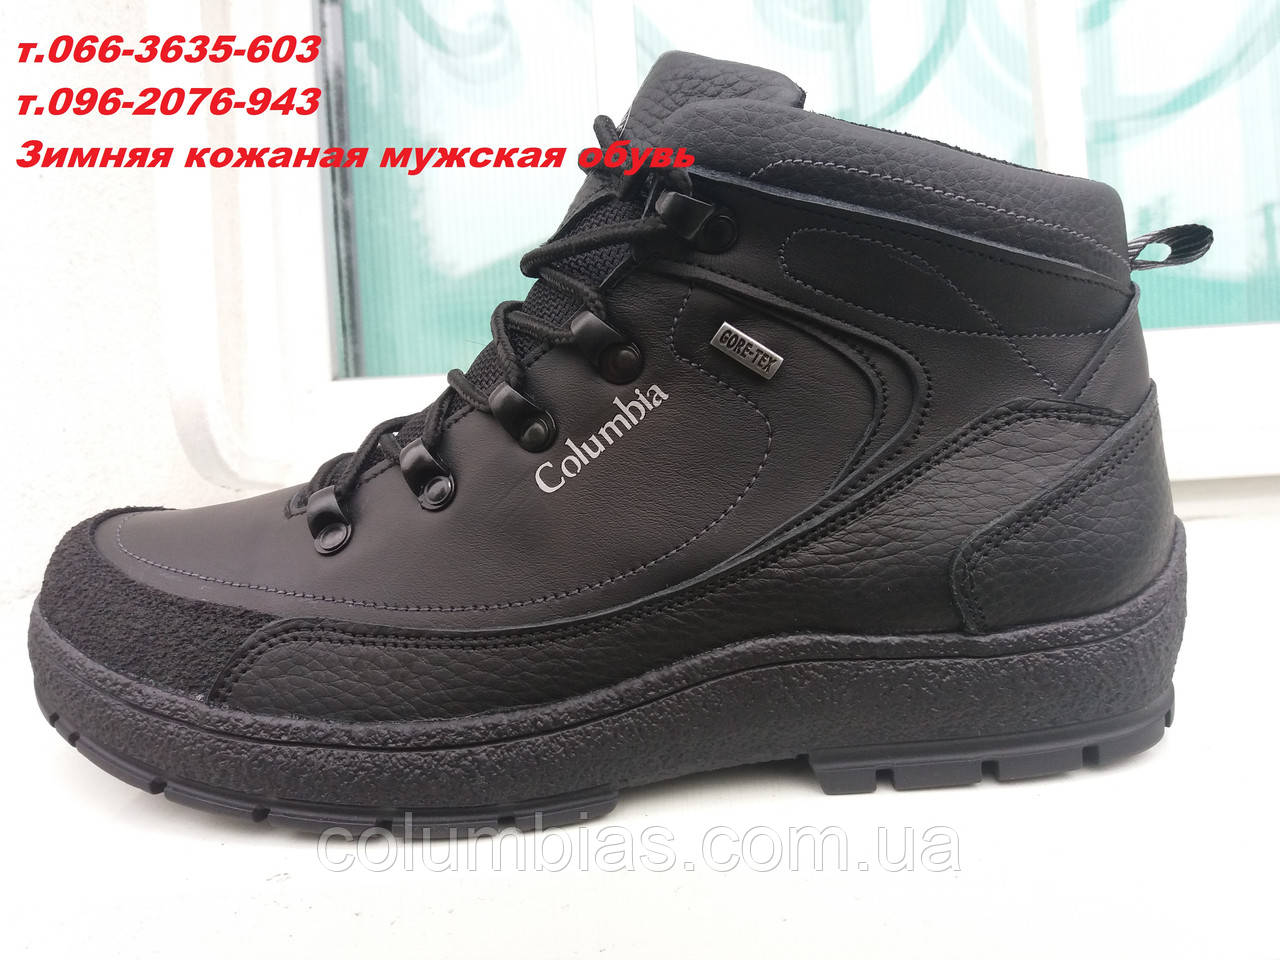 Ботинки Colambia tex усилены